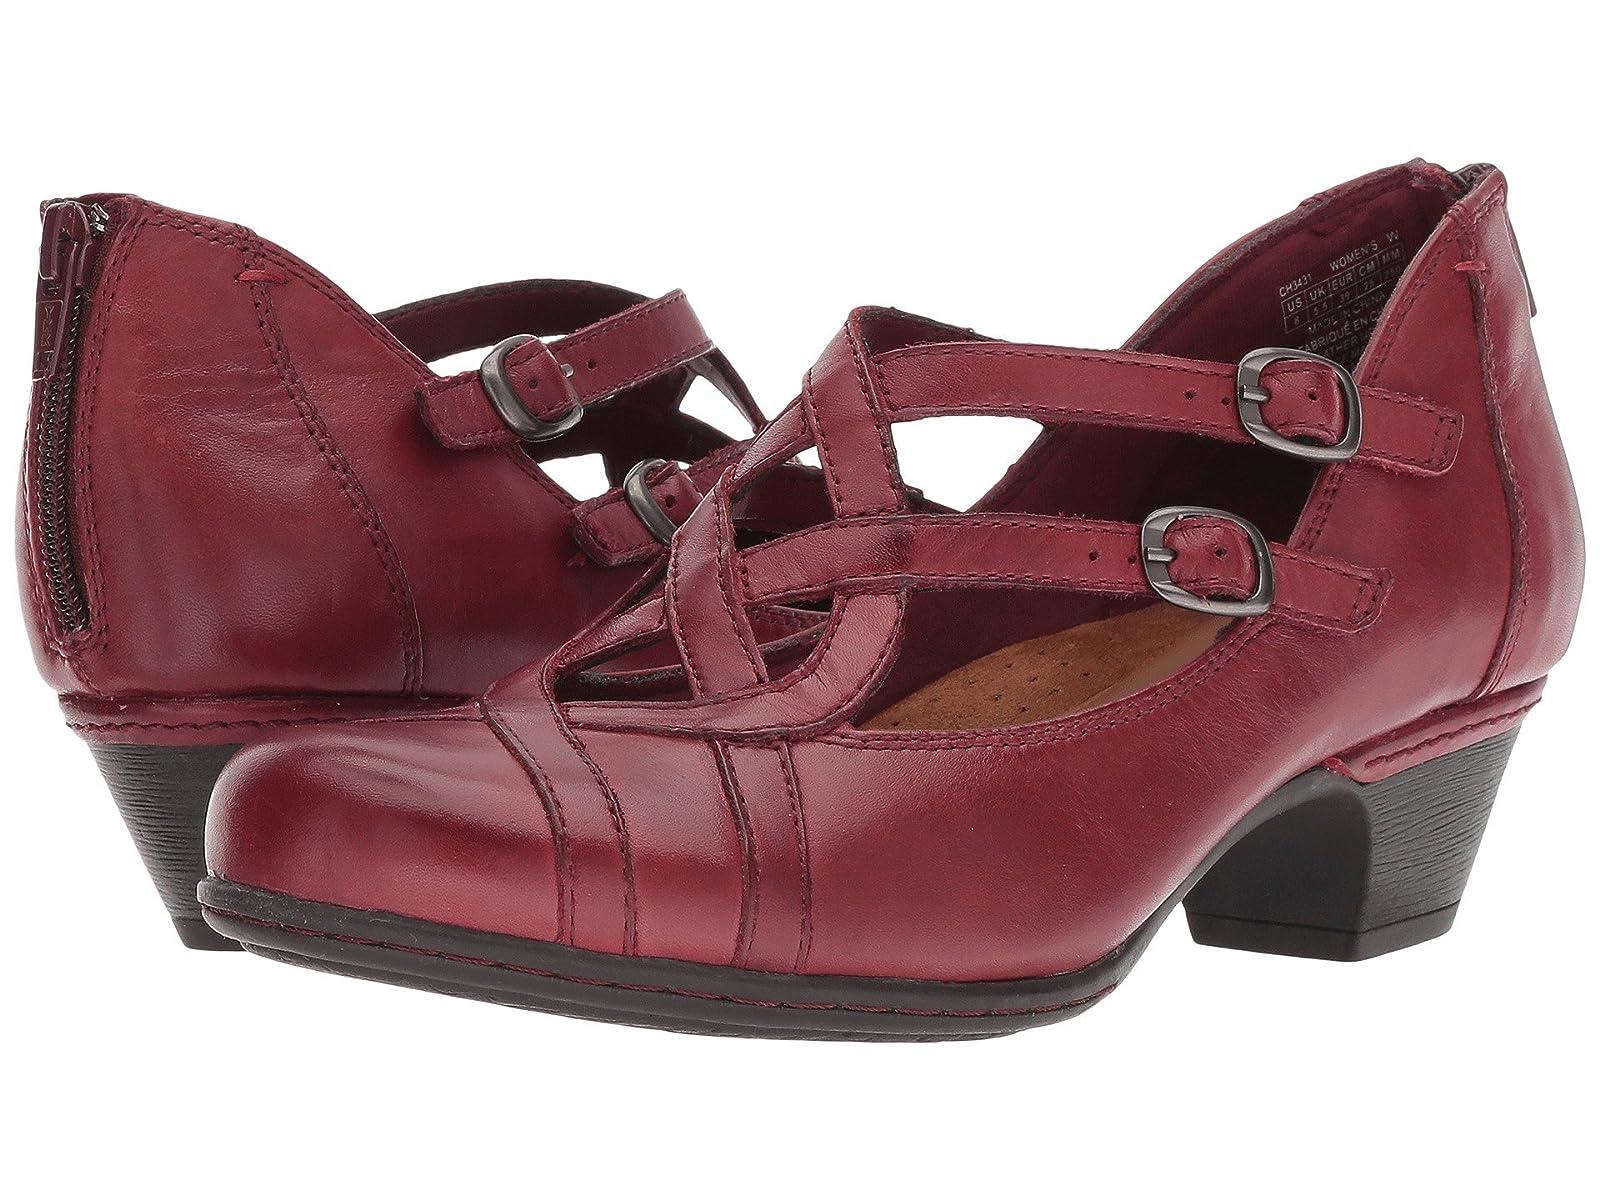 Rockport Total Motion Abbott Curvy ShoeAtmospheric grades have affordable shoes